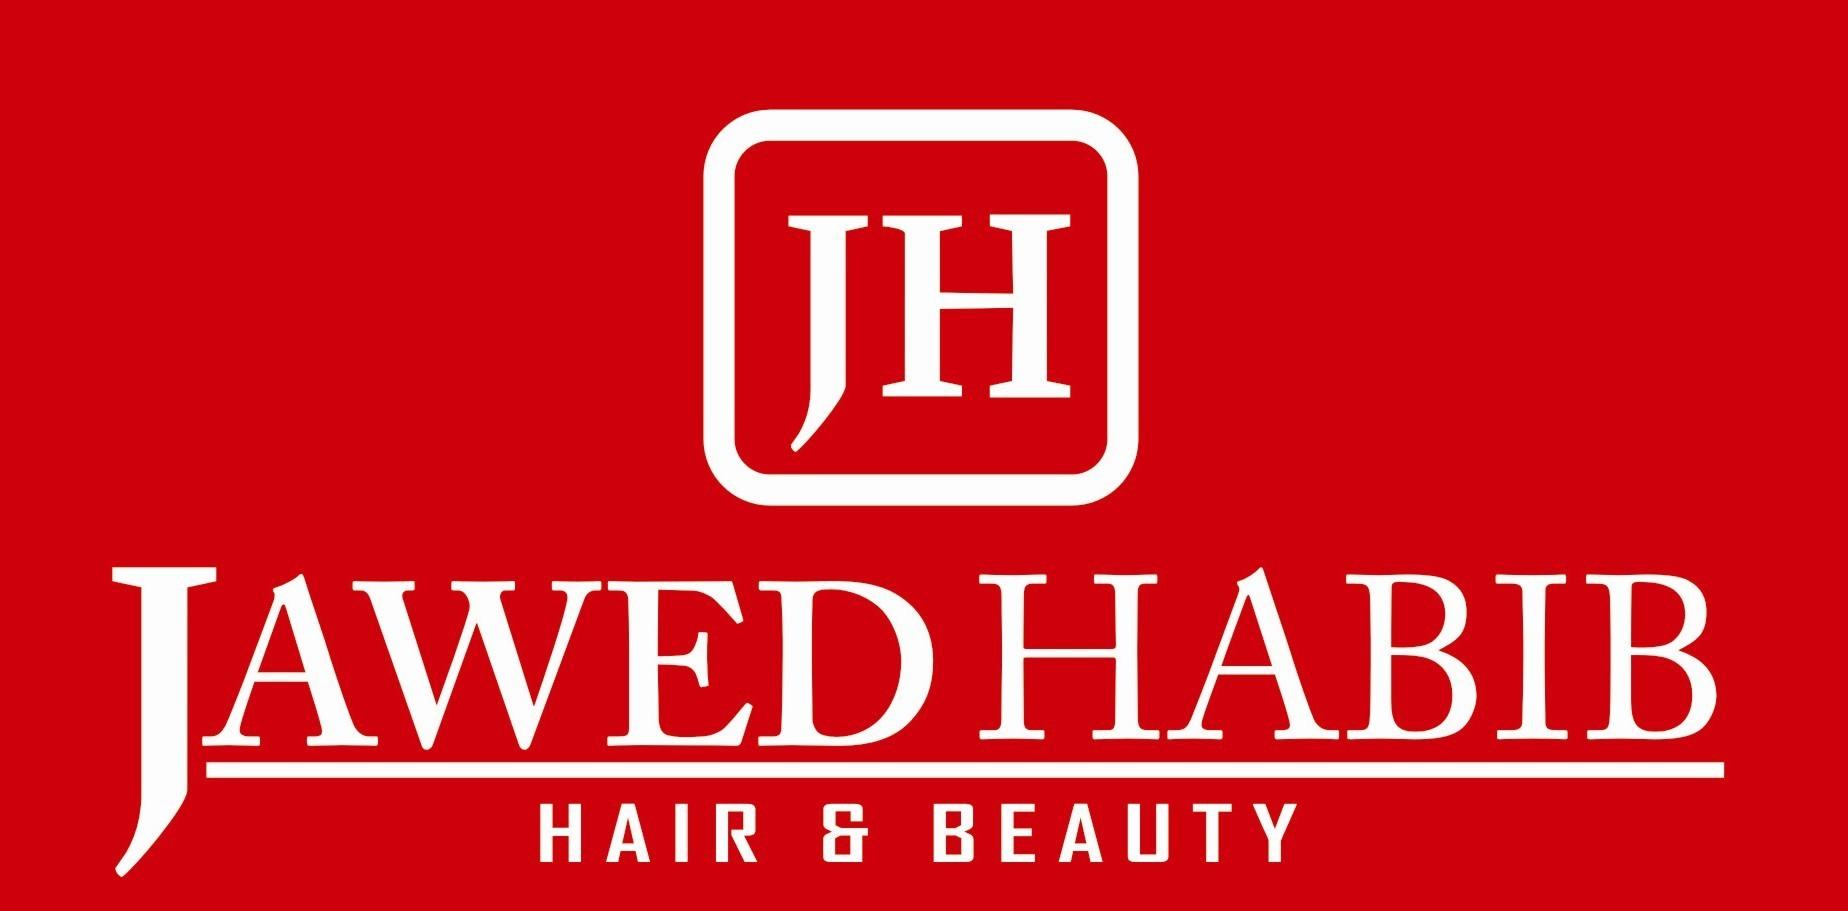 Jawed Habib Hair & Beauty Salons - Ghodbunder Road - Thane Image